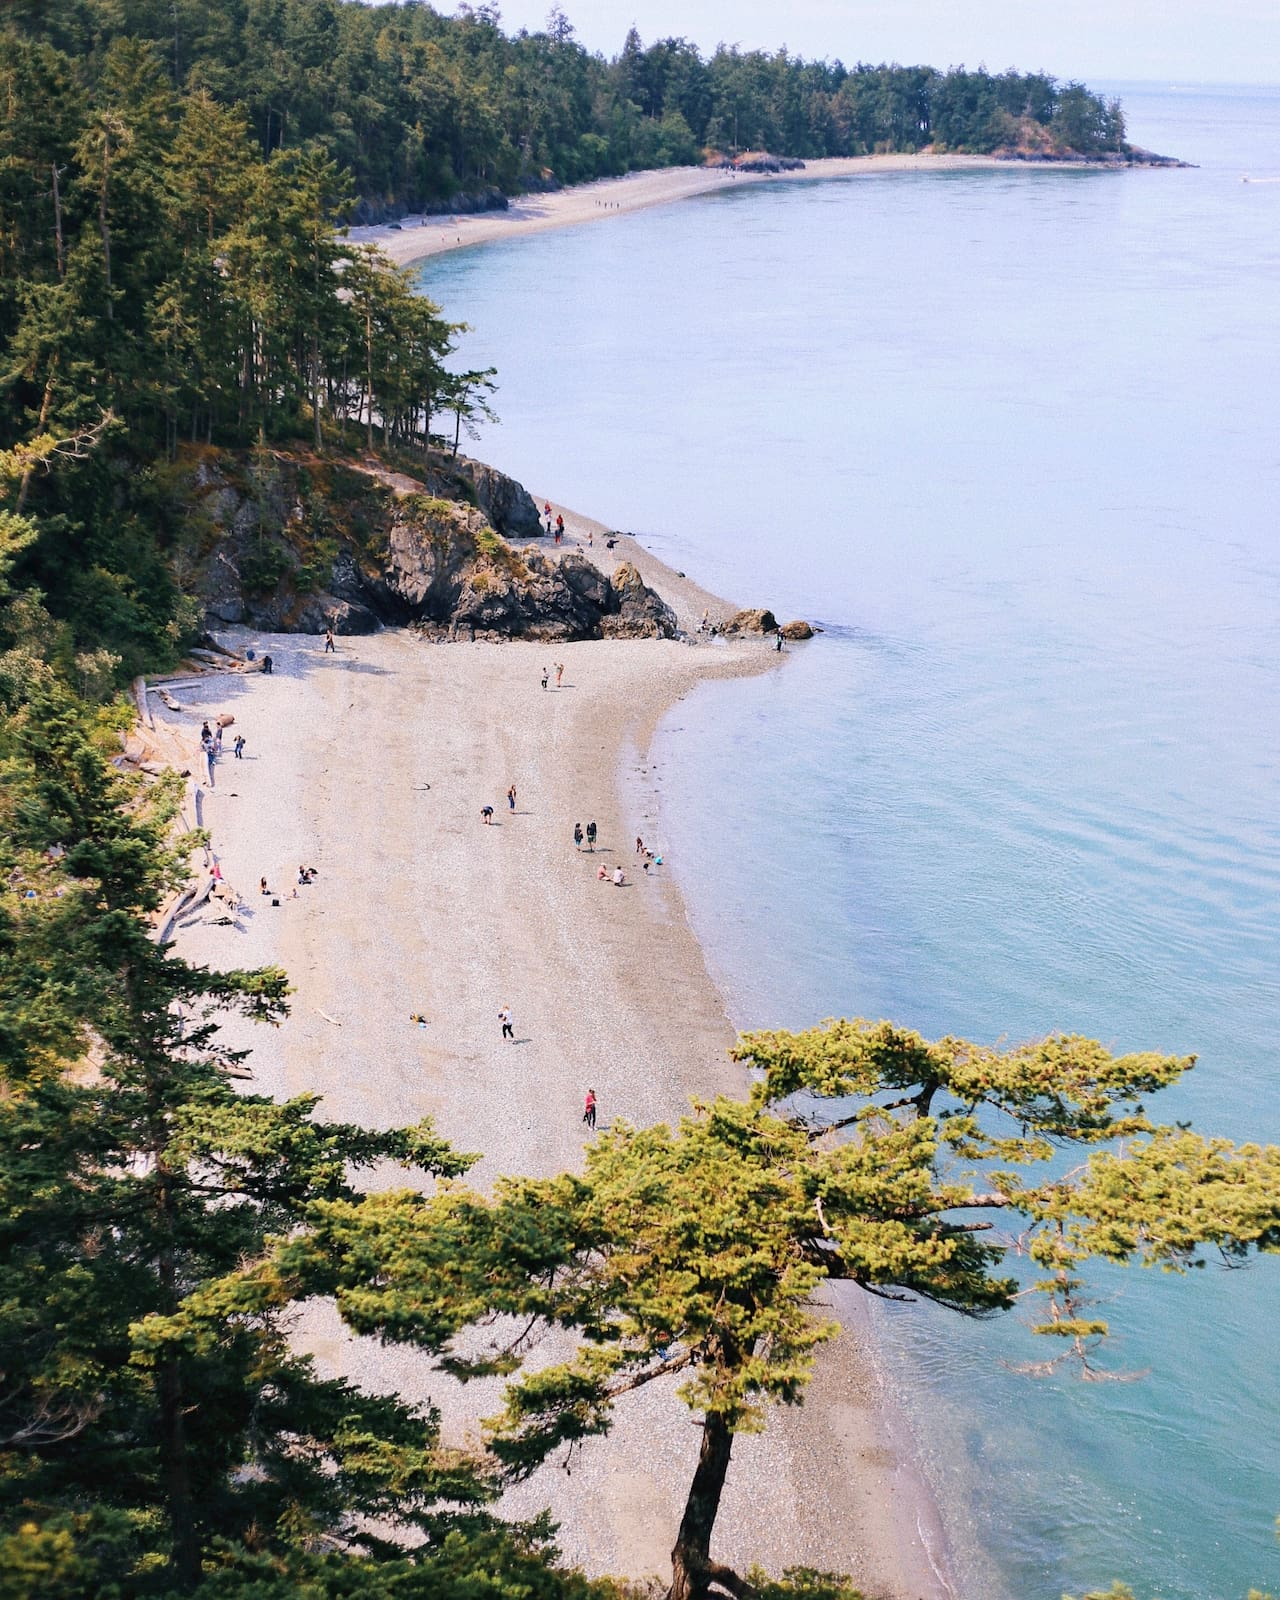 Image looking down upon the coast of Washington.